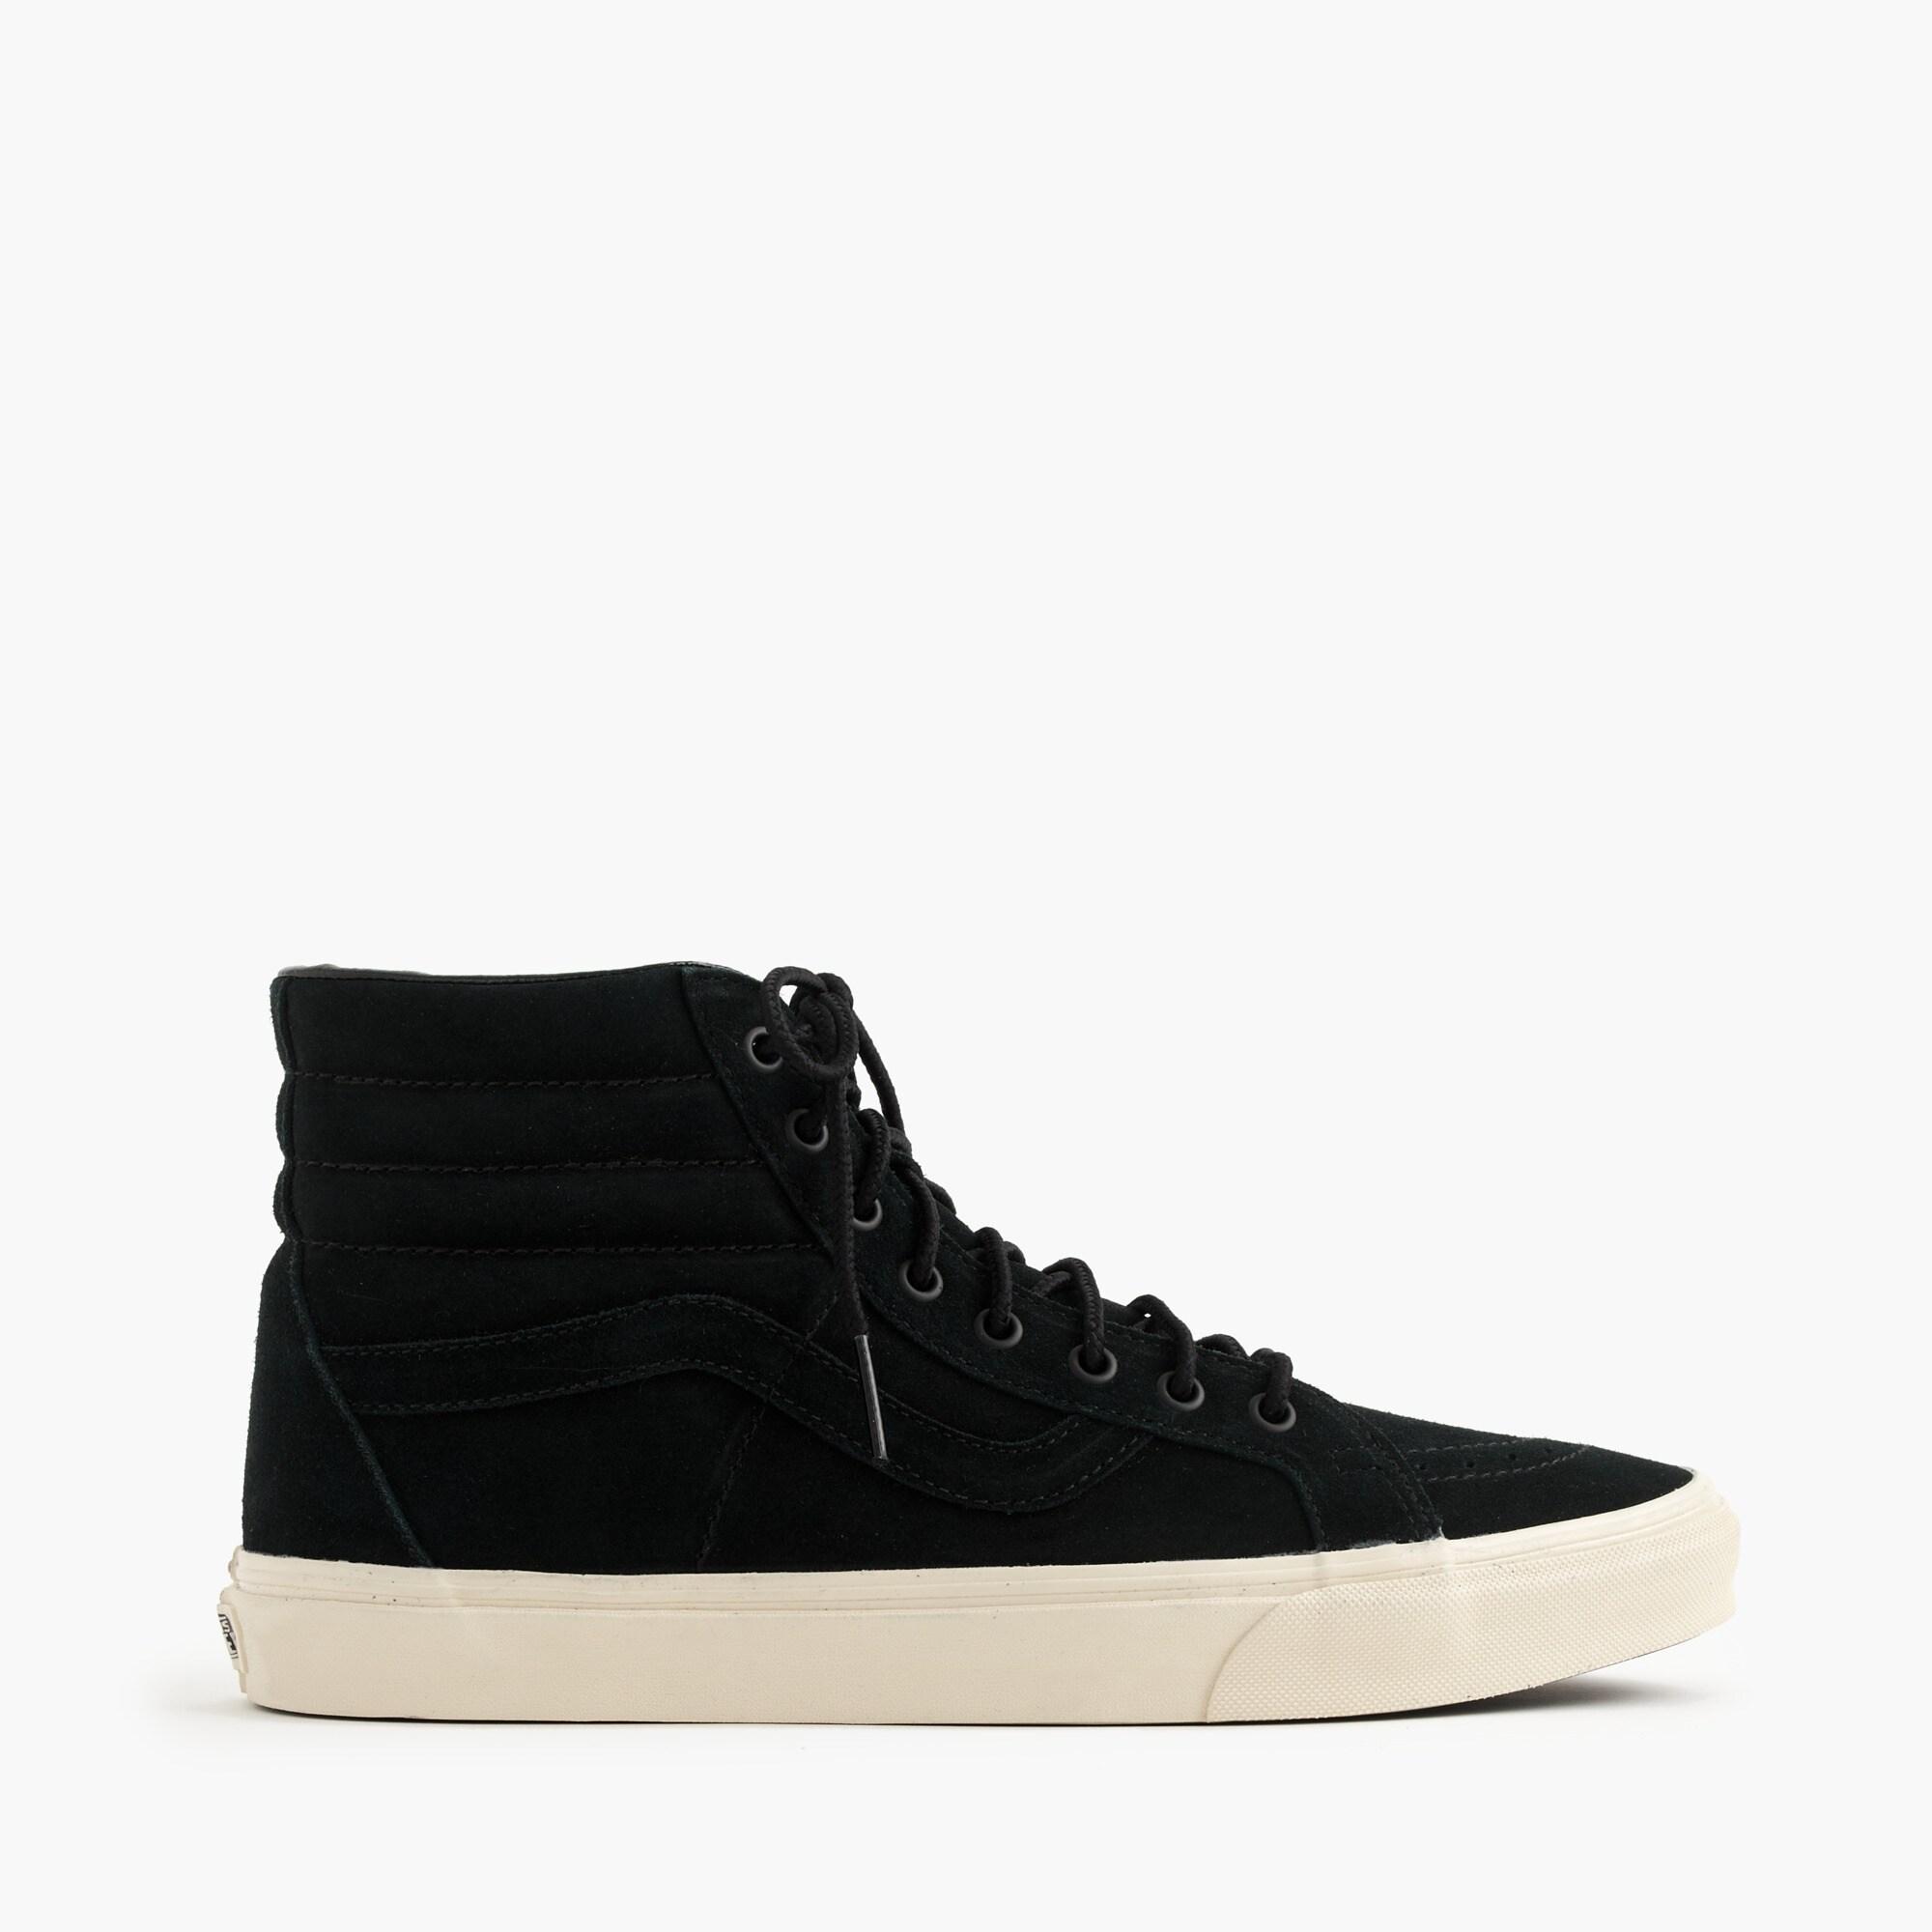 Image 1 for Vans® for J.Crew SK8-Hi sneakers in monotone suede